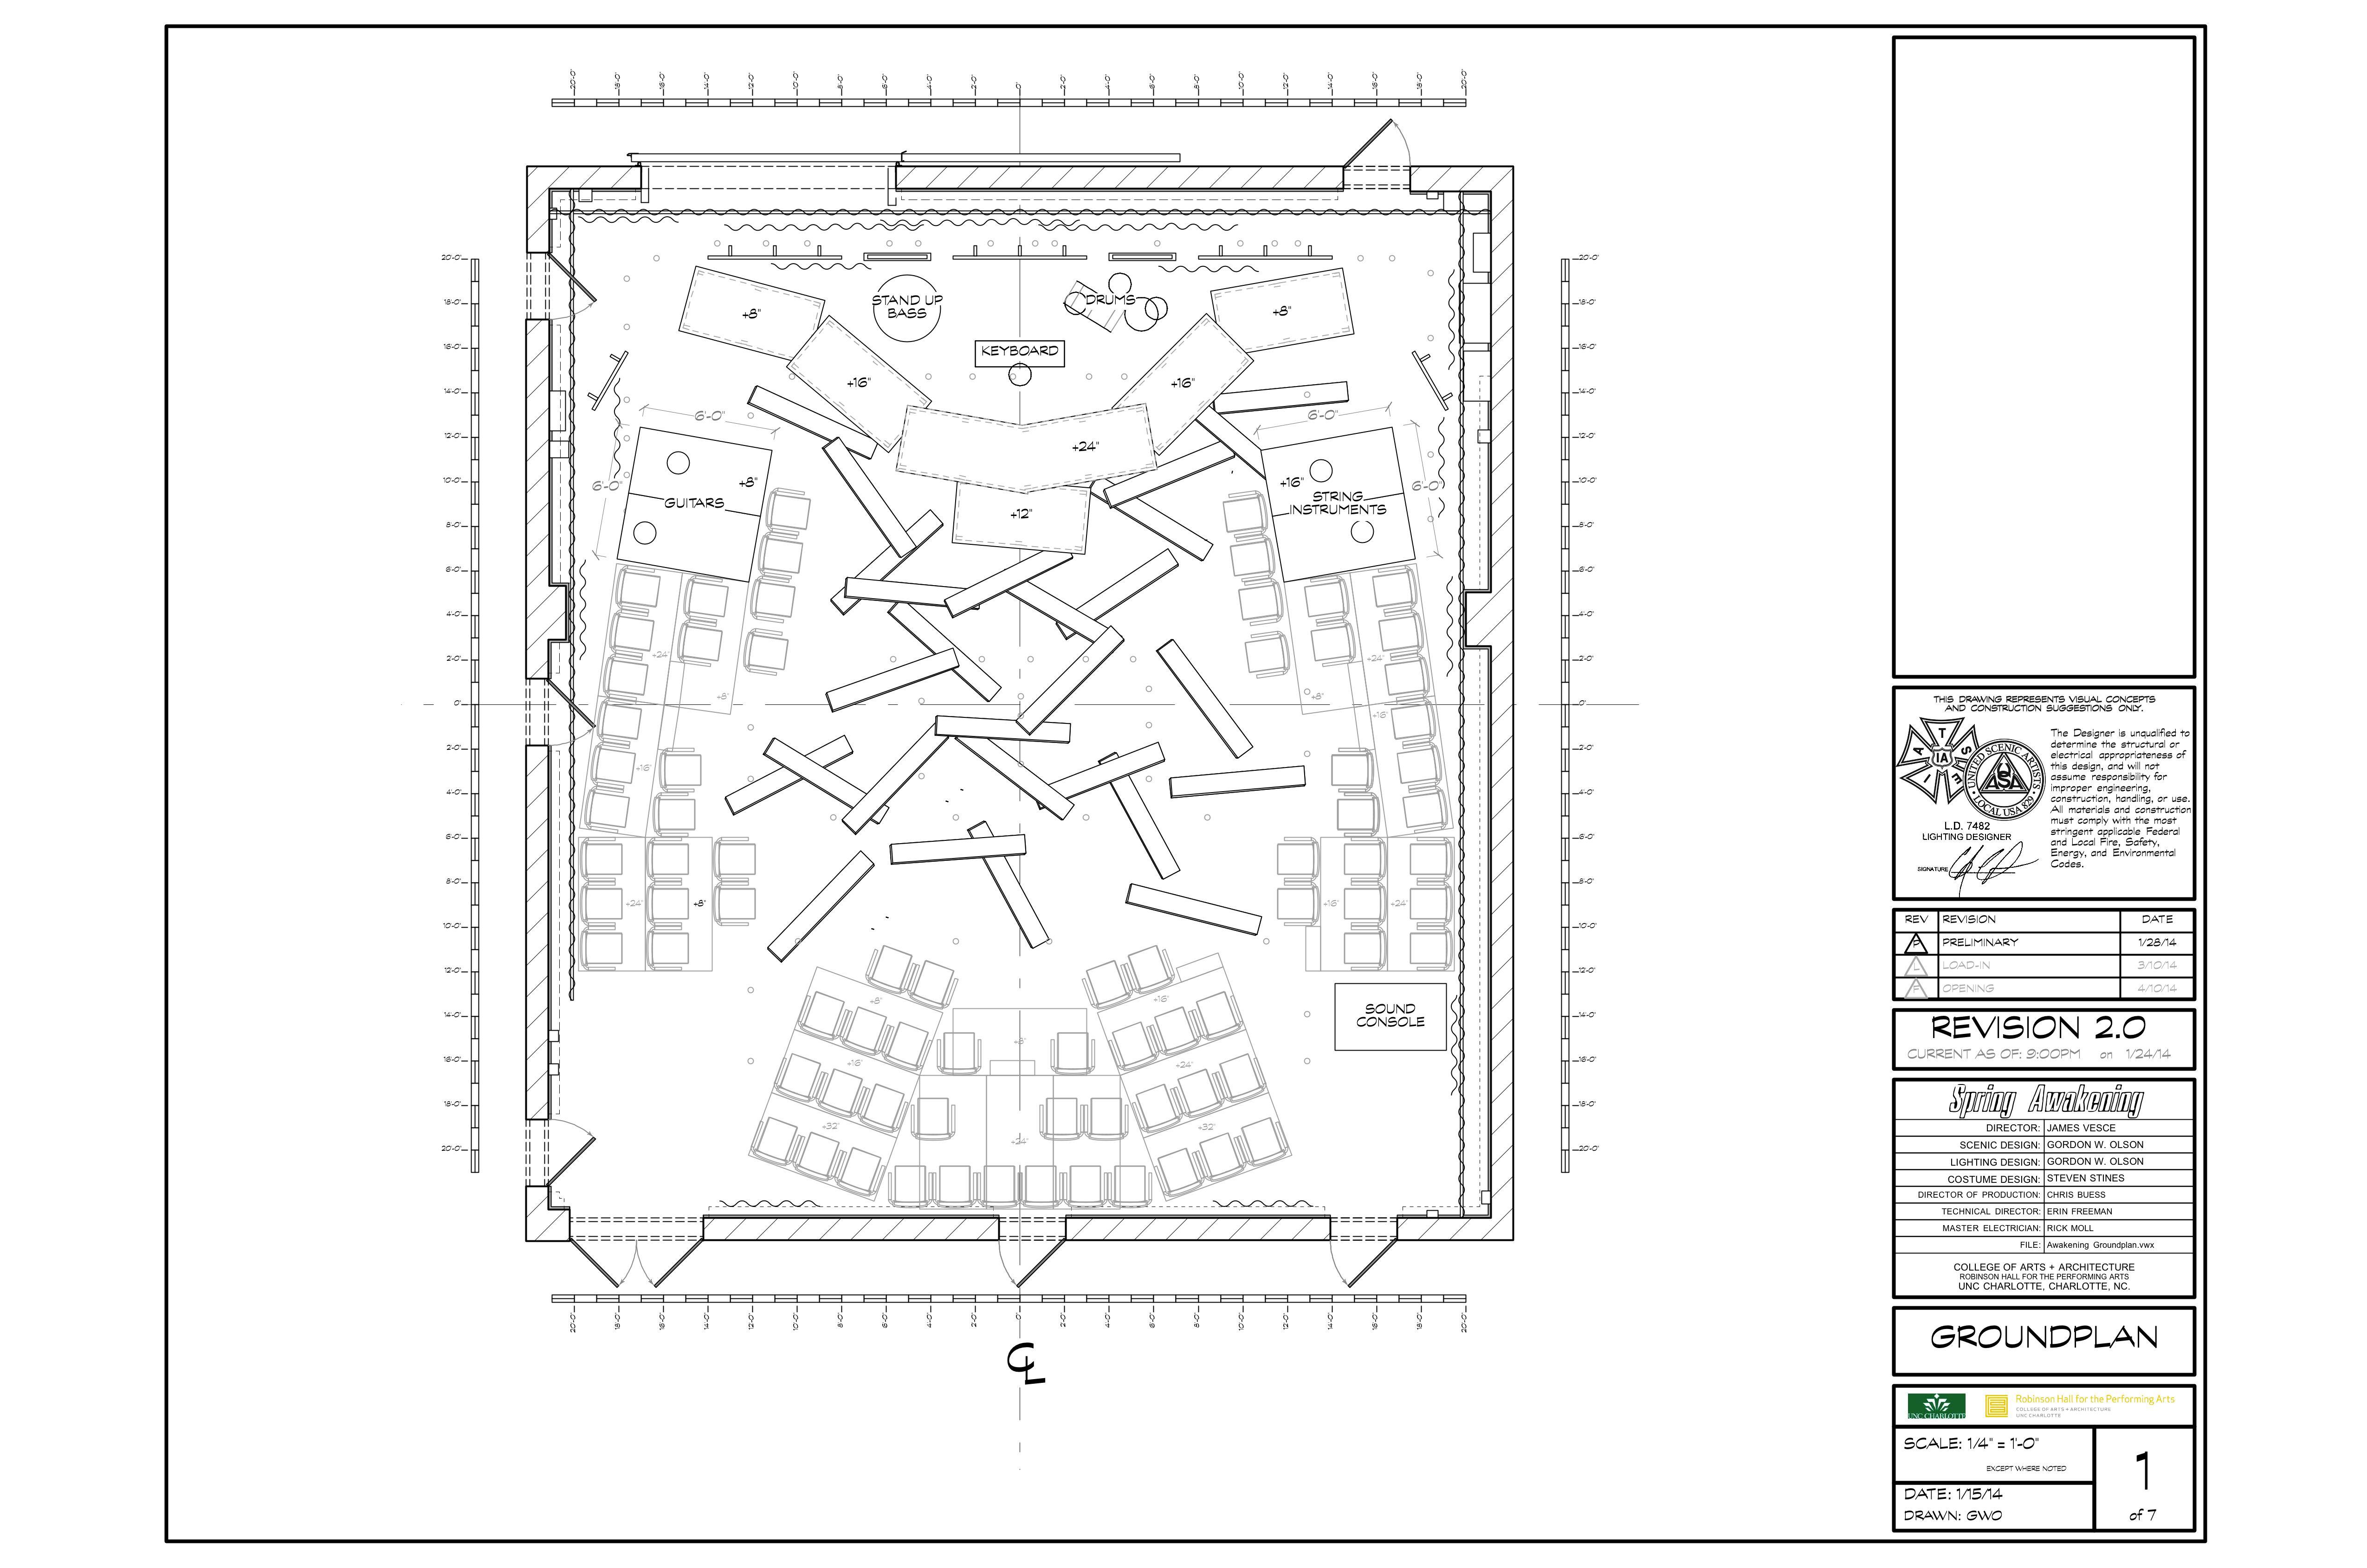 Groundplan